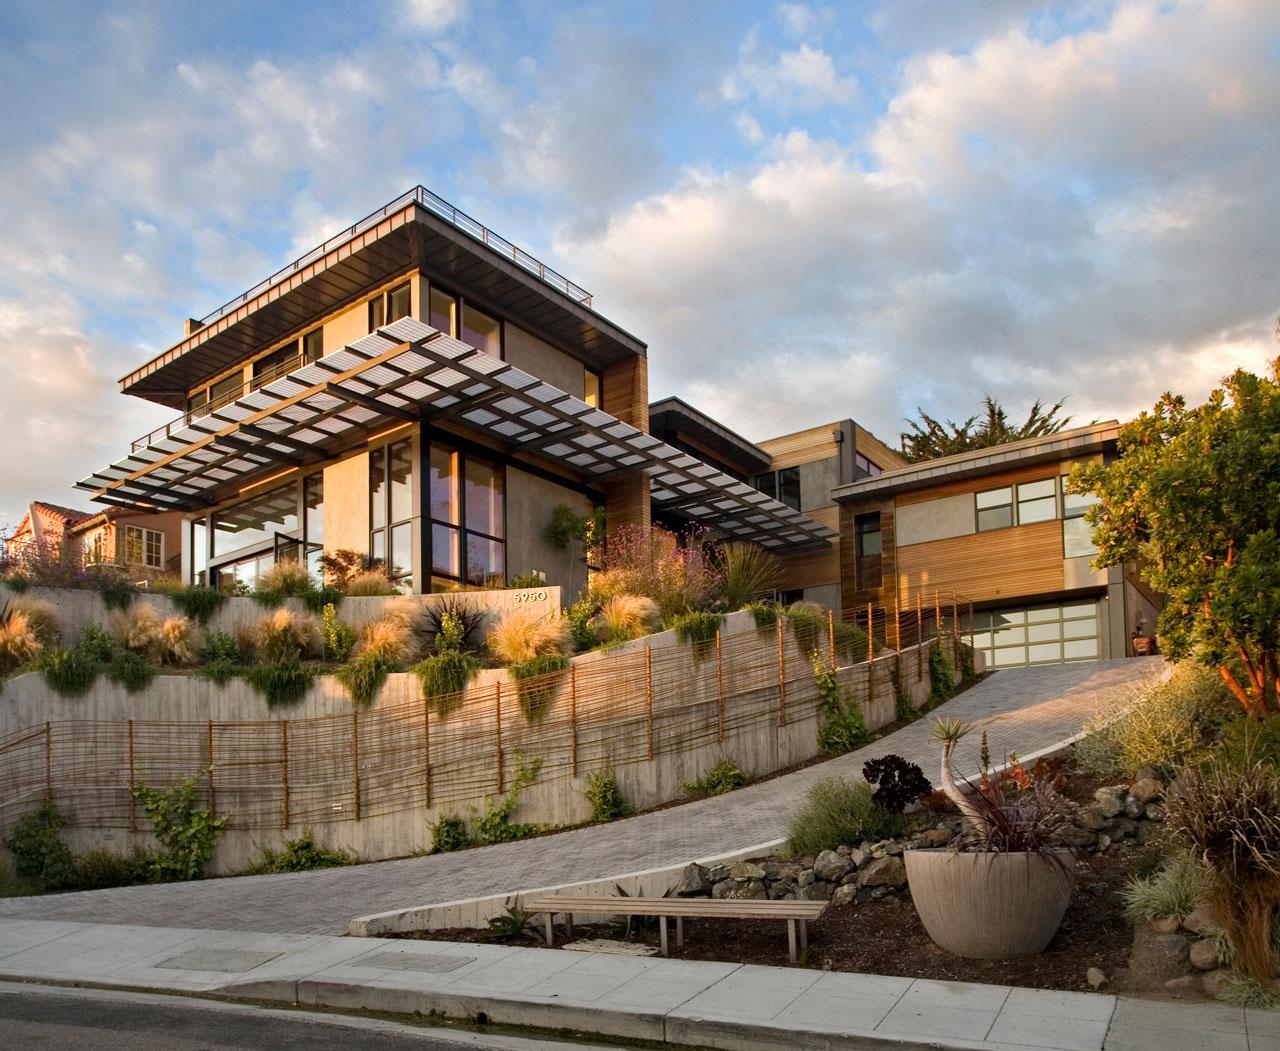 Interior and exterior design of margarido house in california for California home design